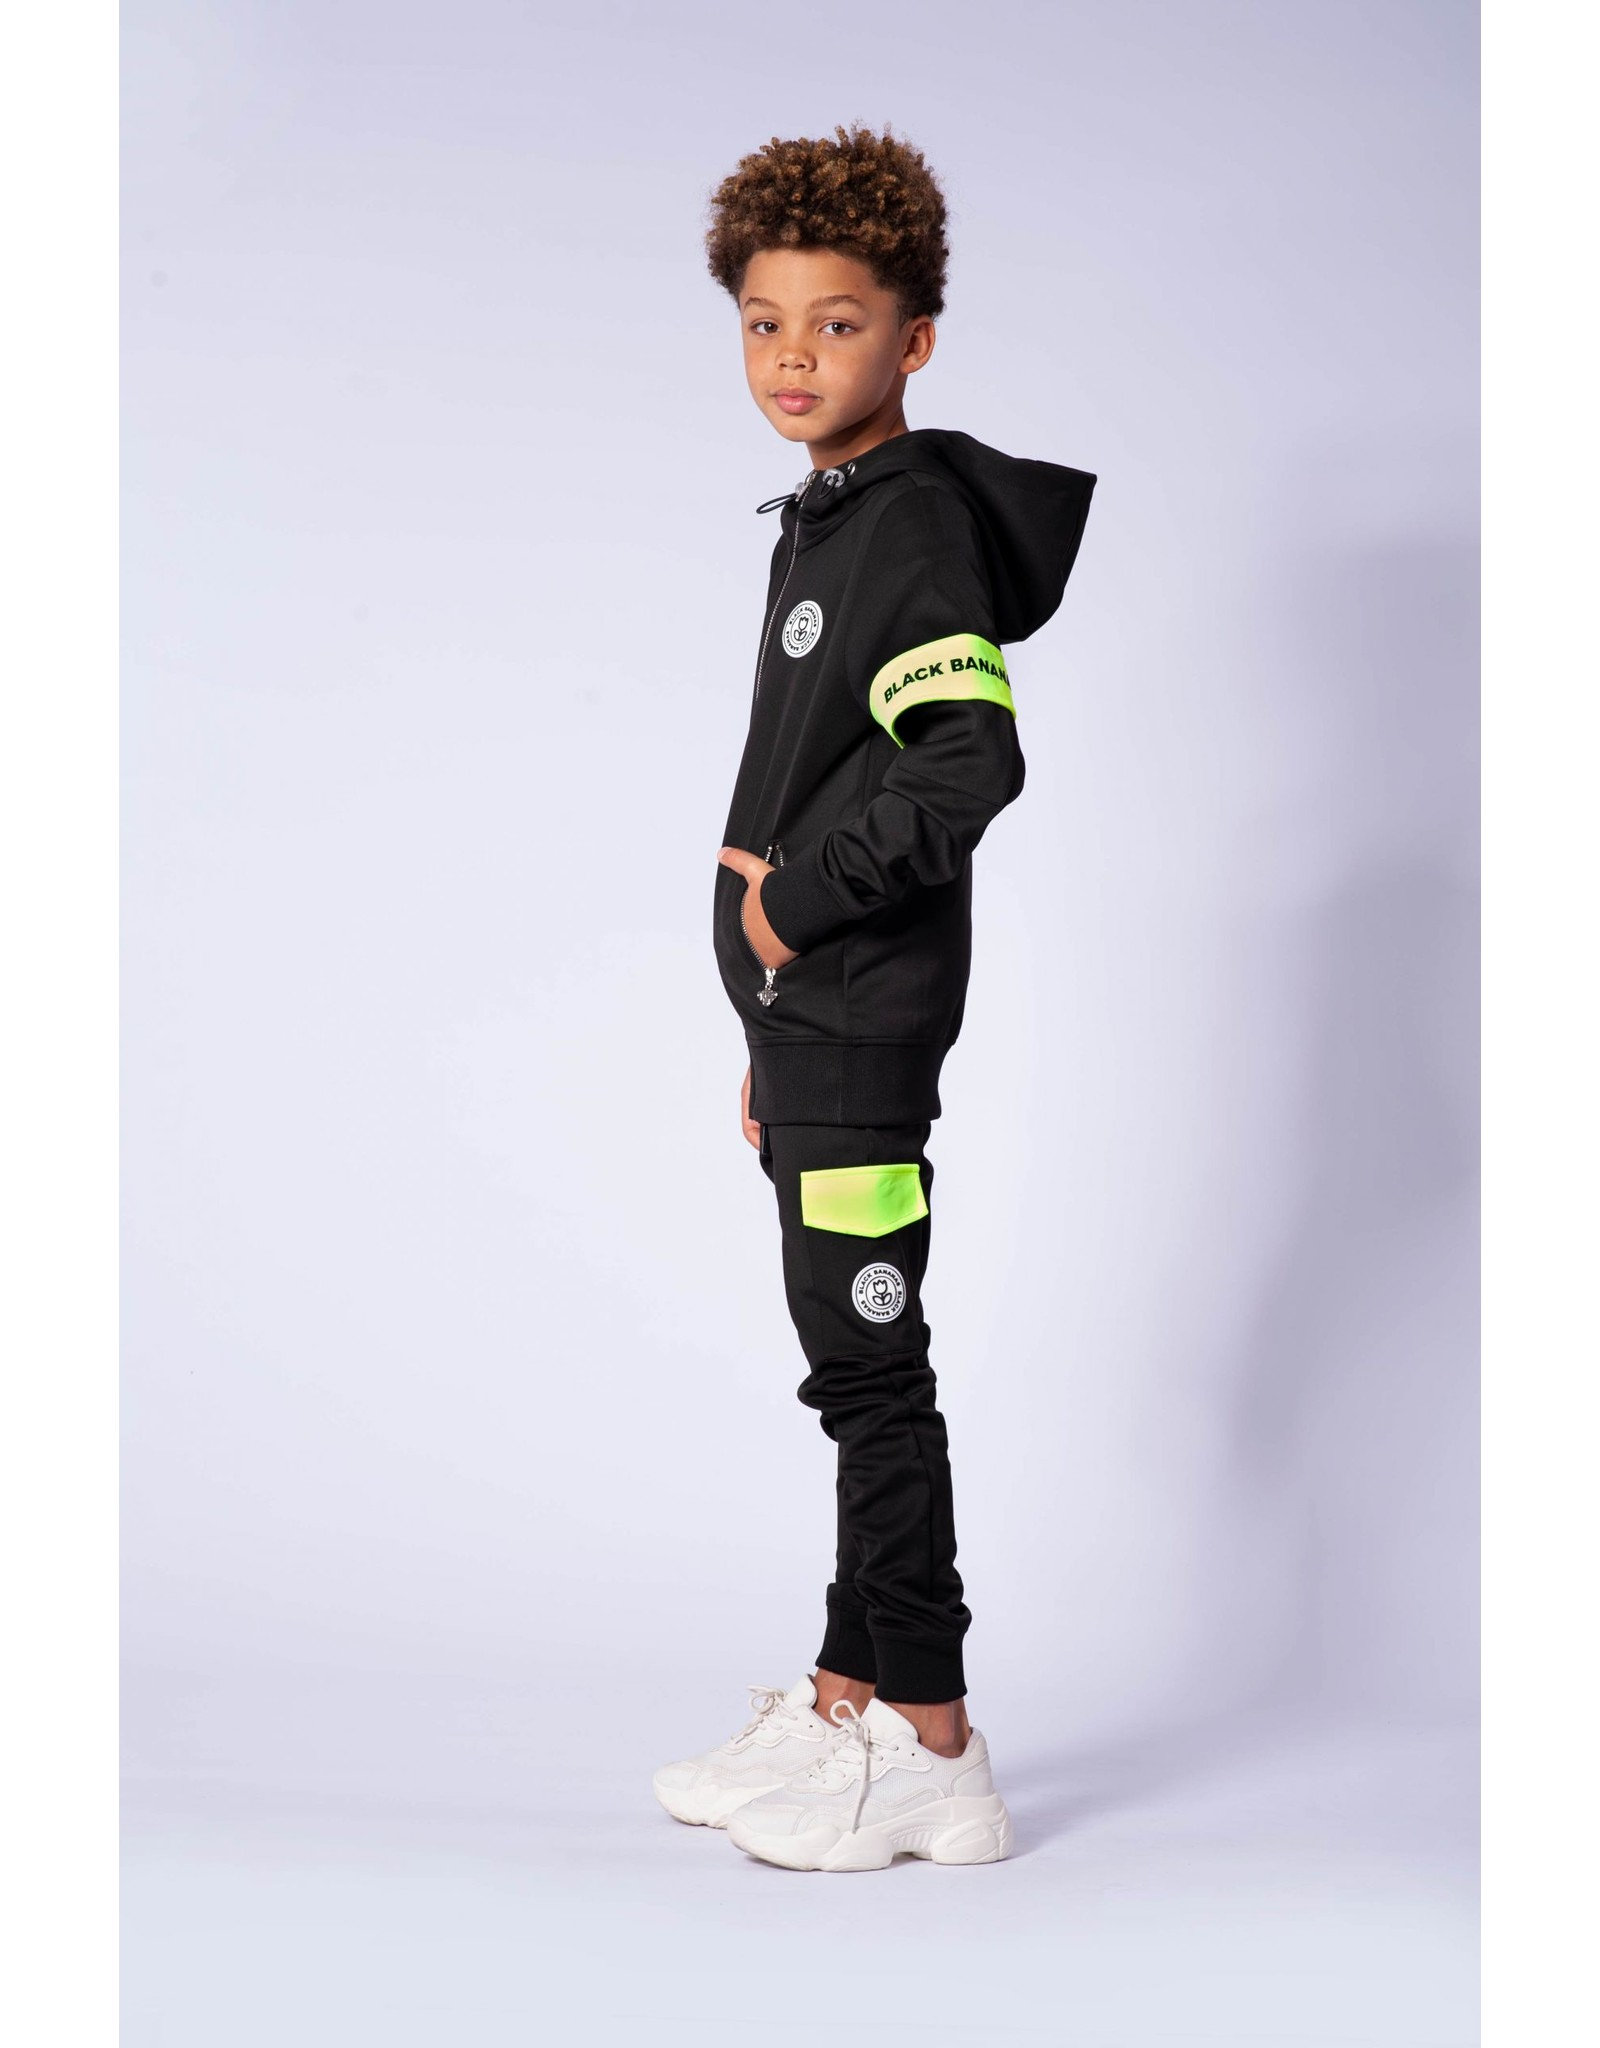 Black Bananas Jr. Command Tracksuit Black